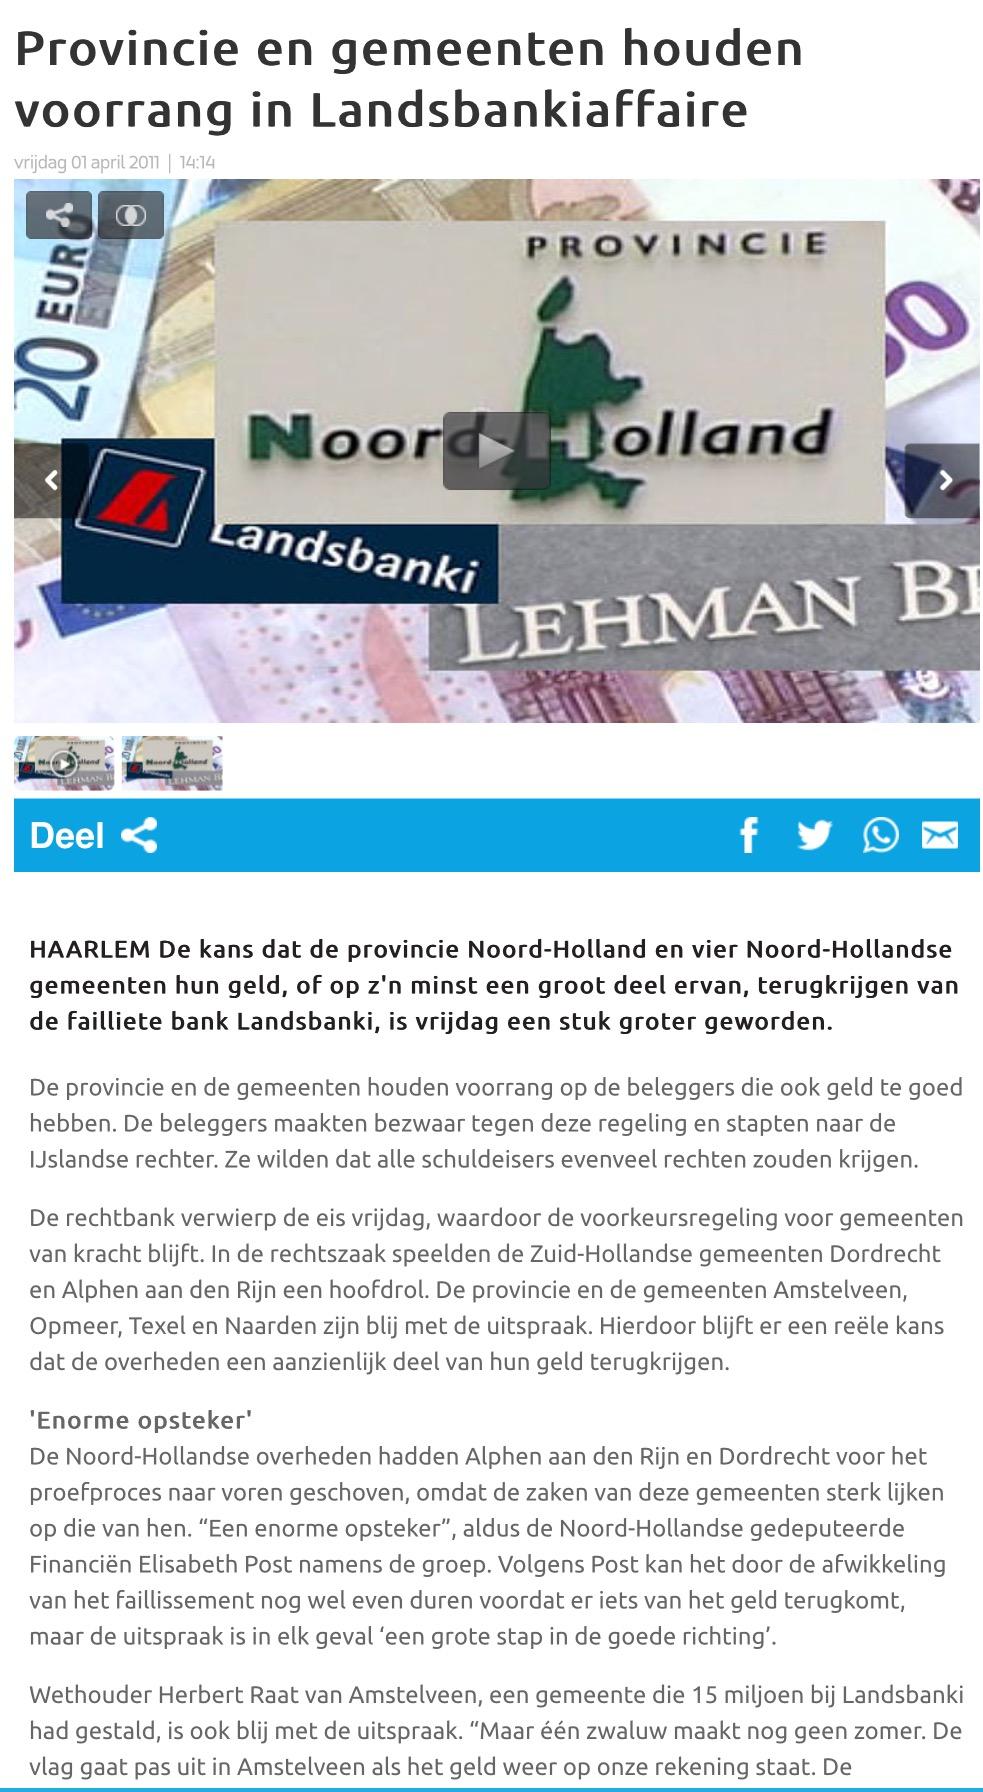 2011-1-4 RTV Noord Holland-Herbert Raat over Landsbanki Amstelveen